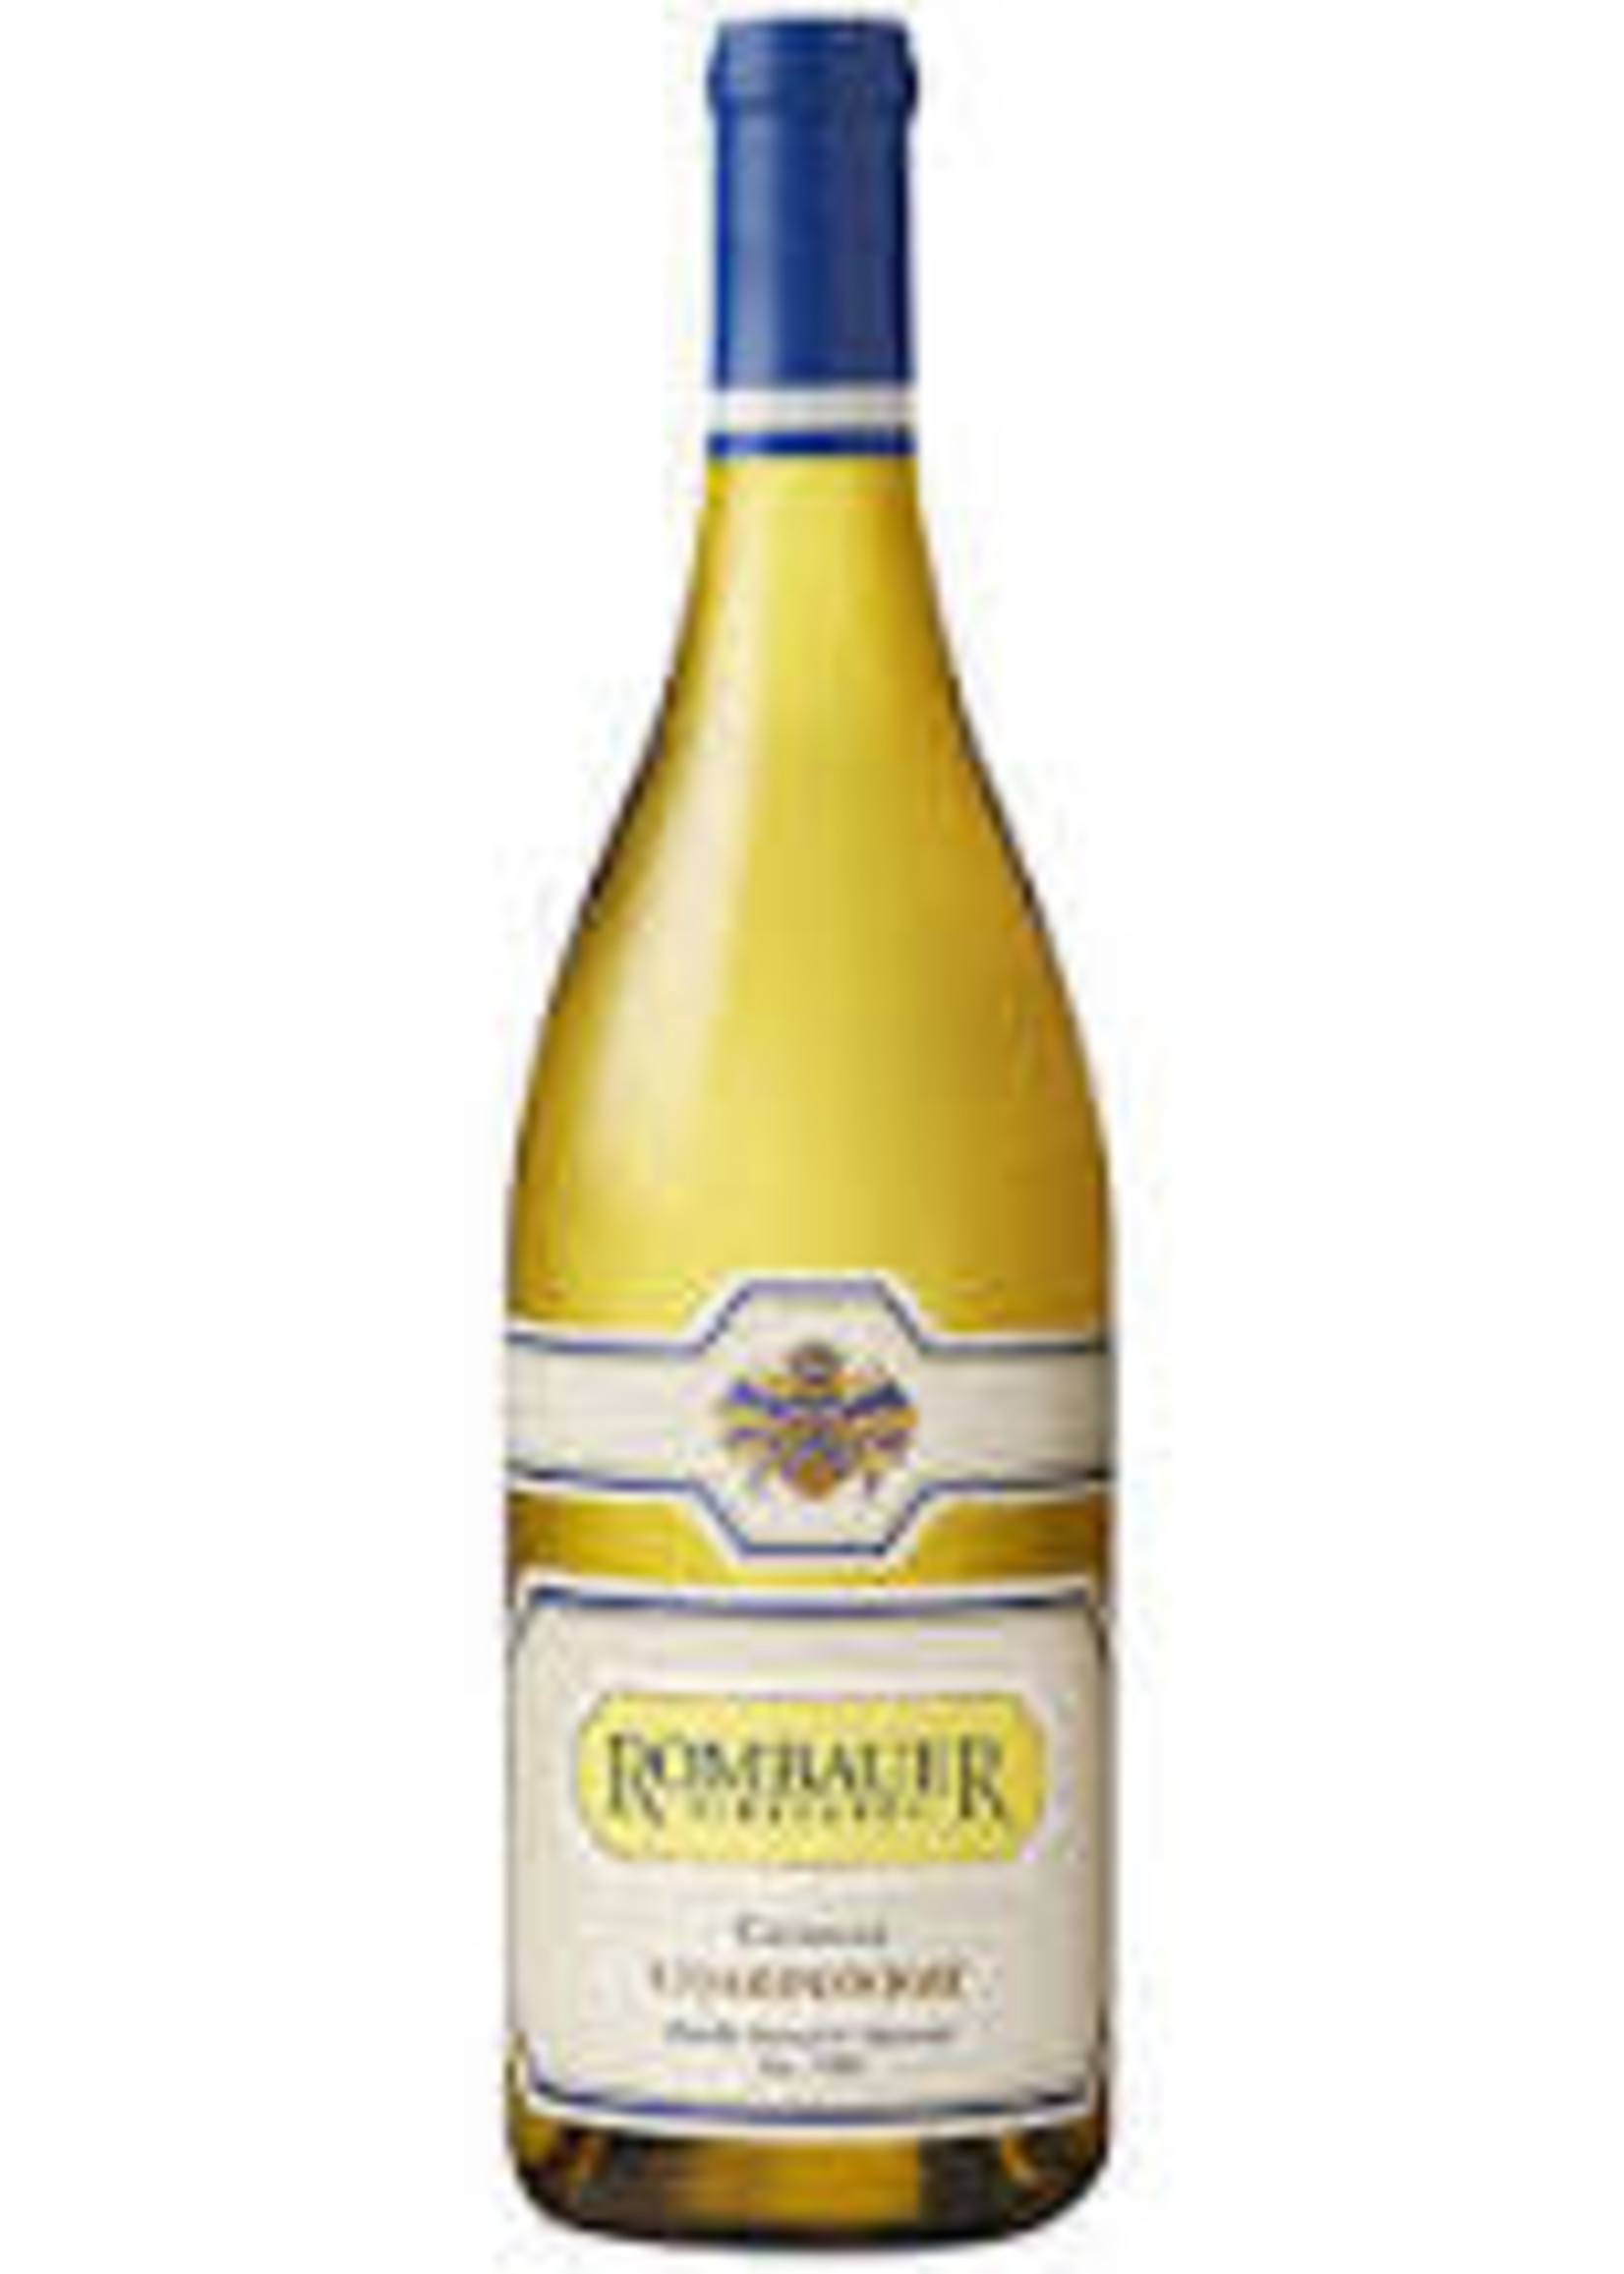 Rombauer 2019 Chardonnay 750ml